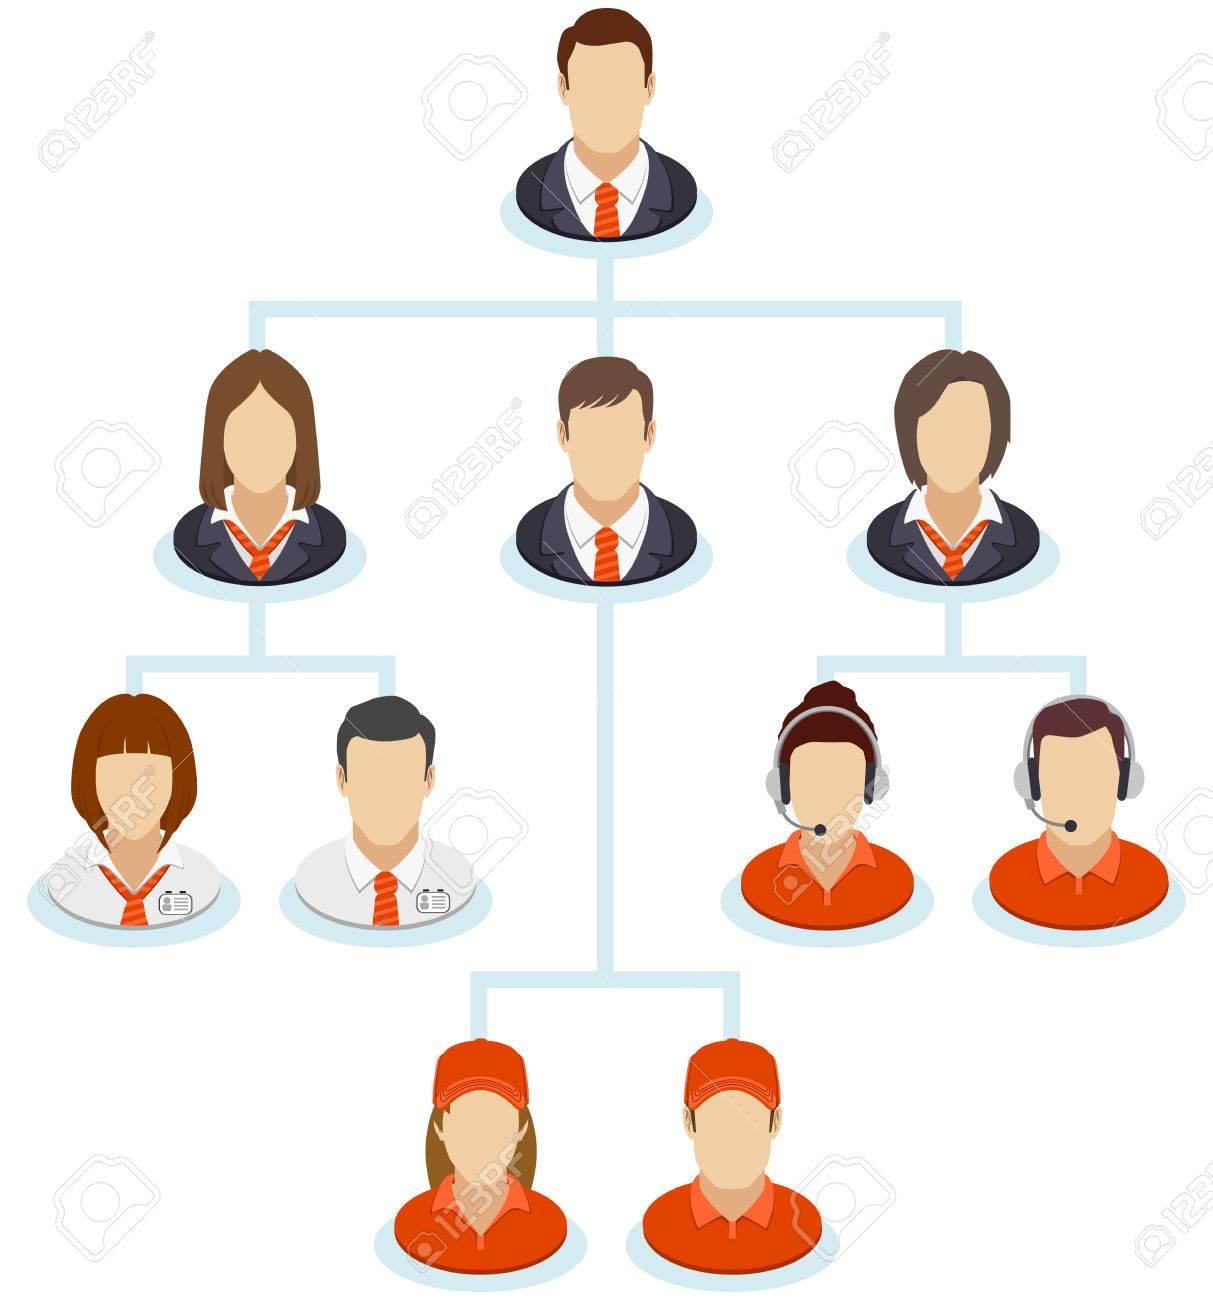 Free download clip art. Teamwork clipart team structure